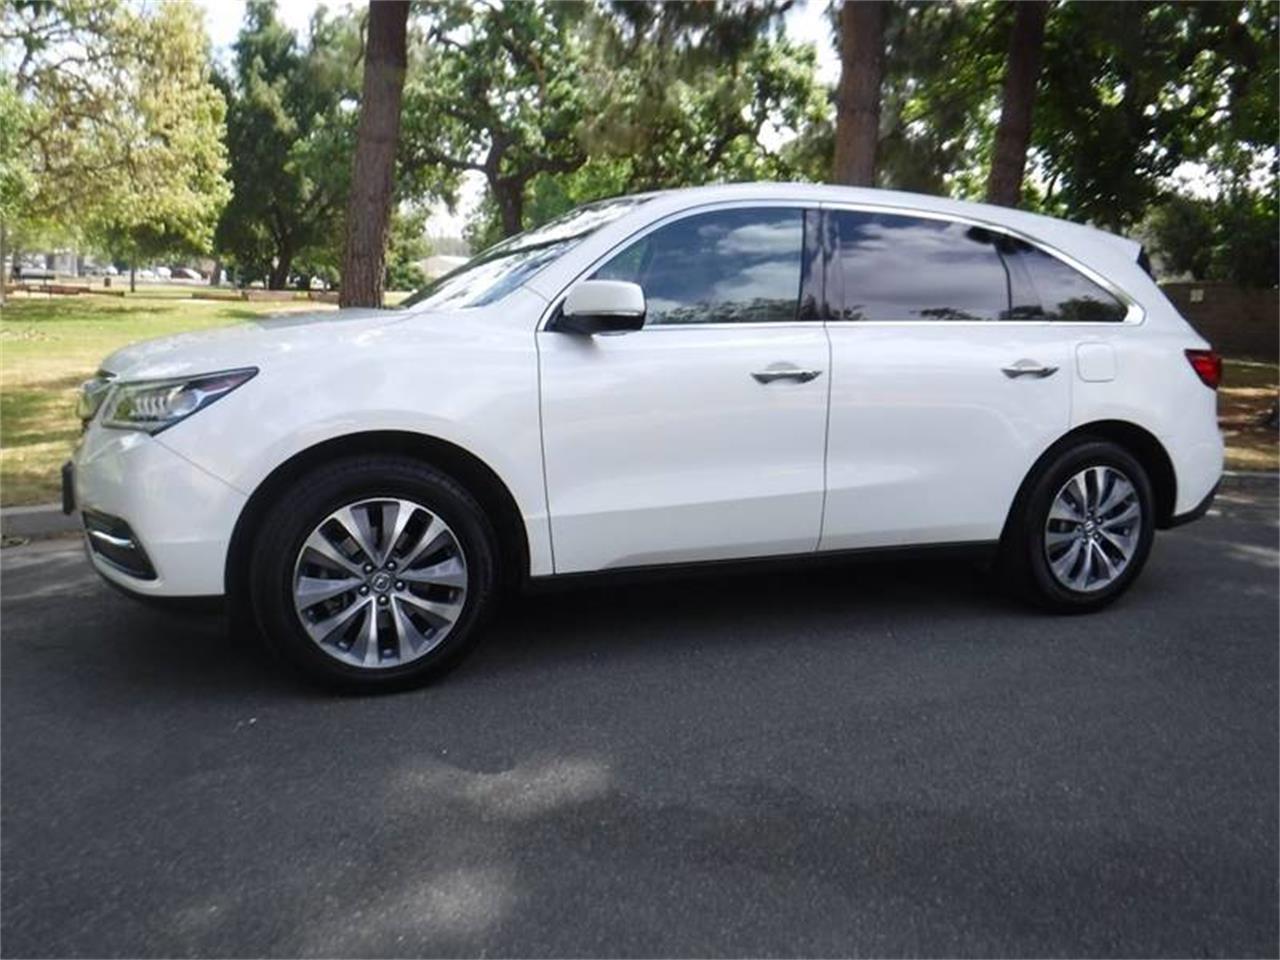 Acura Thousand Oaks >> For Sale 2014 Acura Mdx In Thousand Oaks California